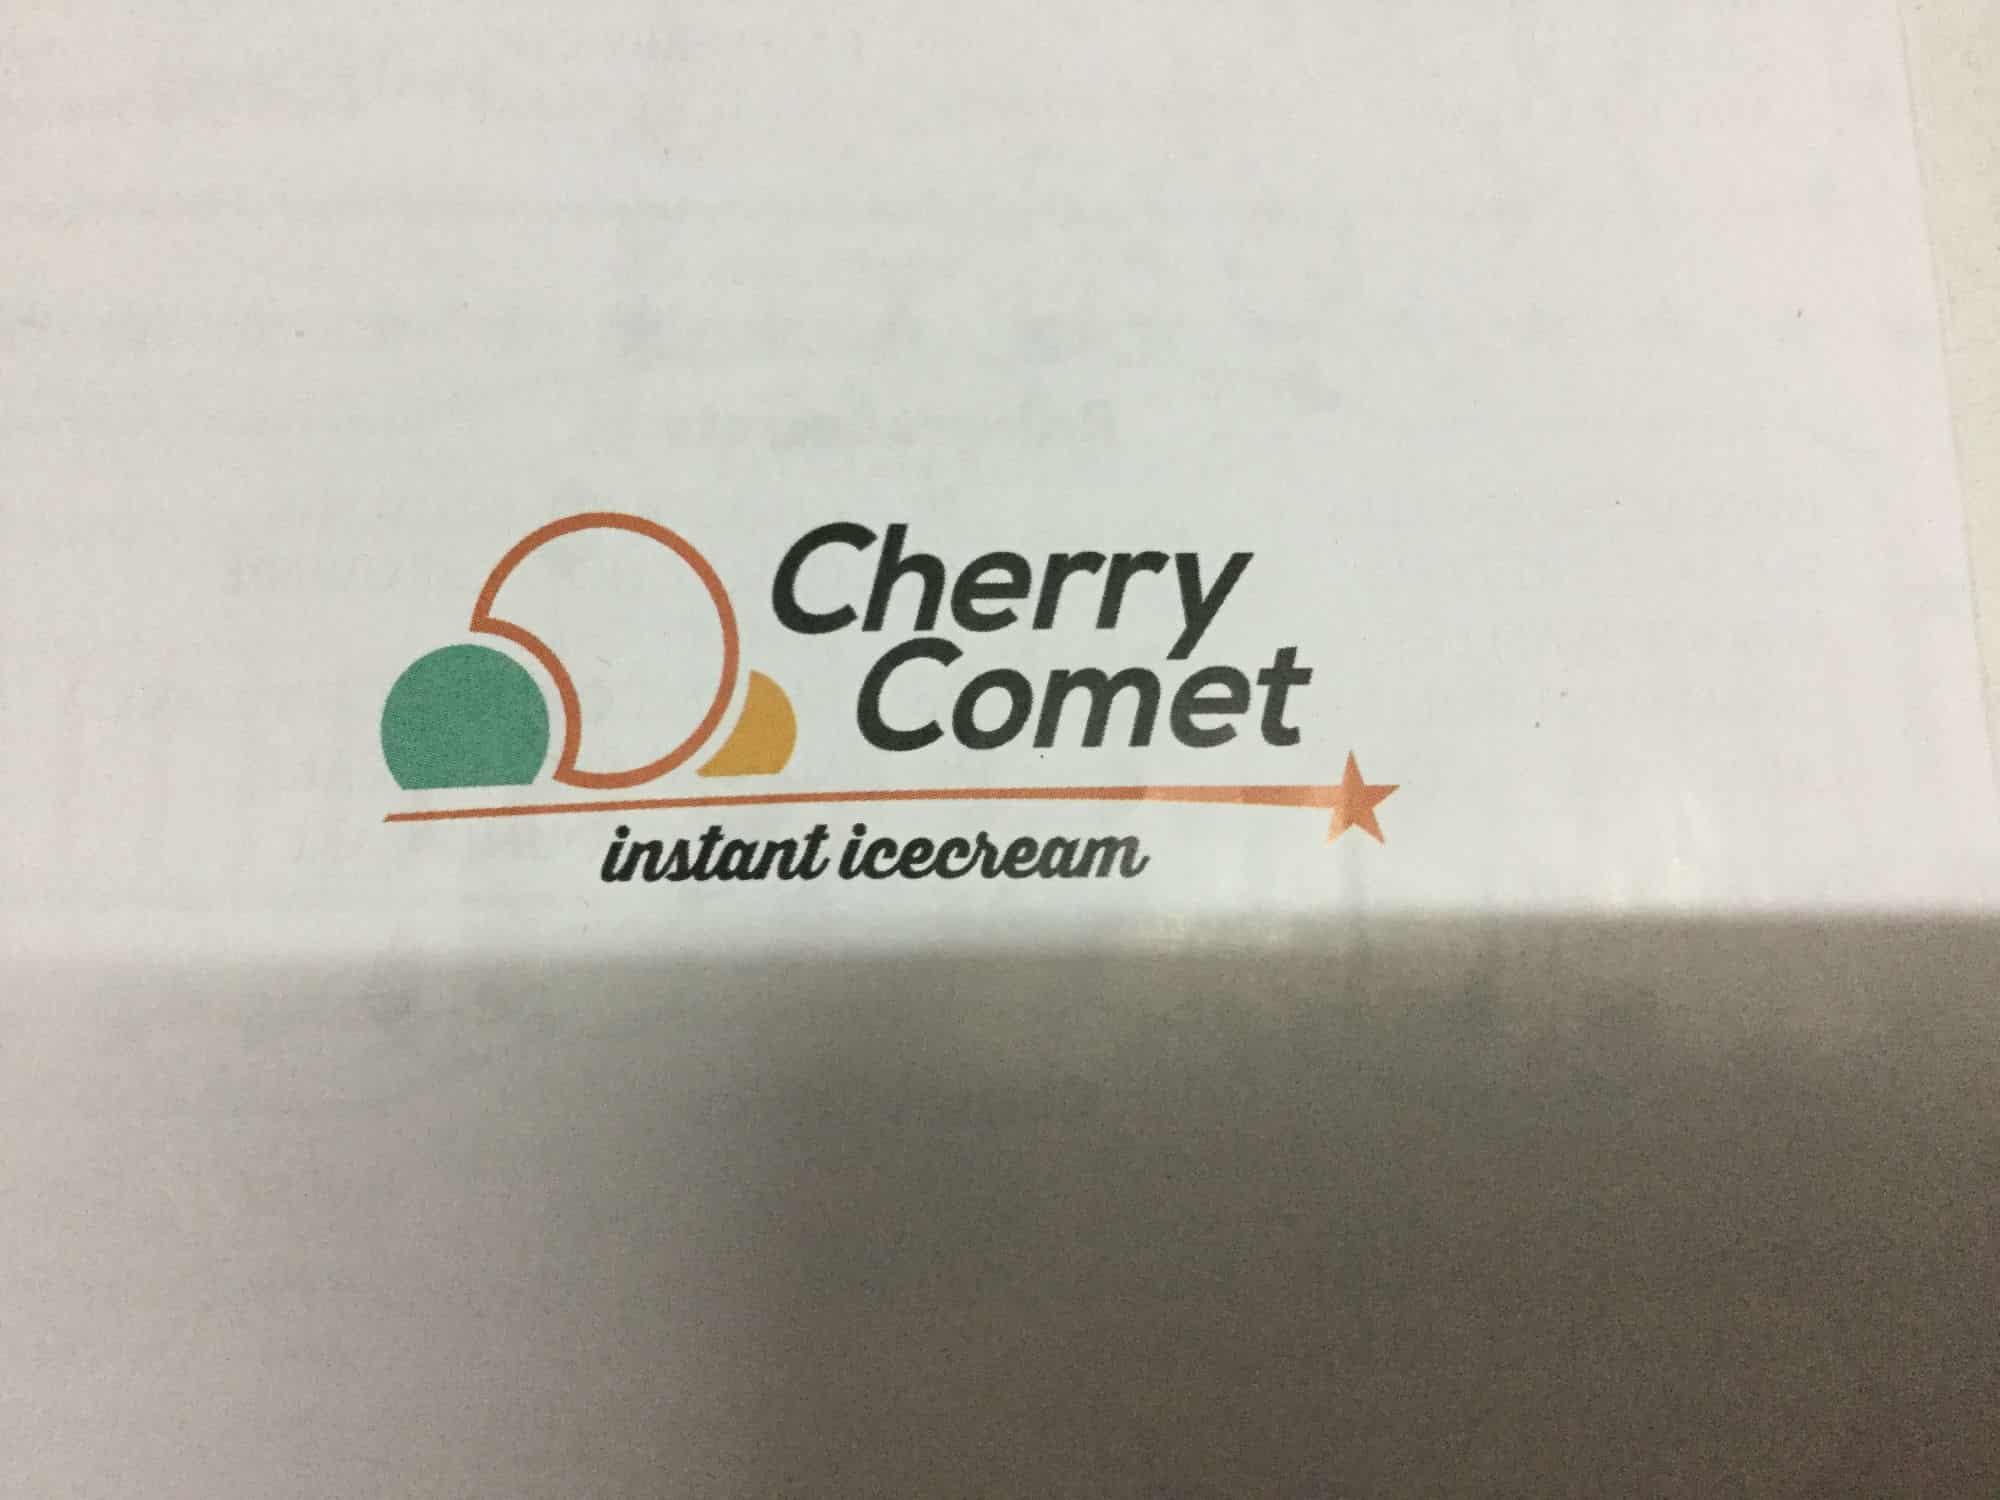 Cherry Comet Photos, Sushant Lok Phase 1, Delhi- Pictures & Images